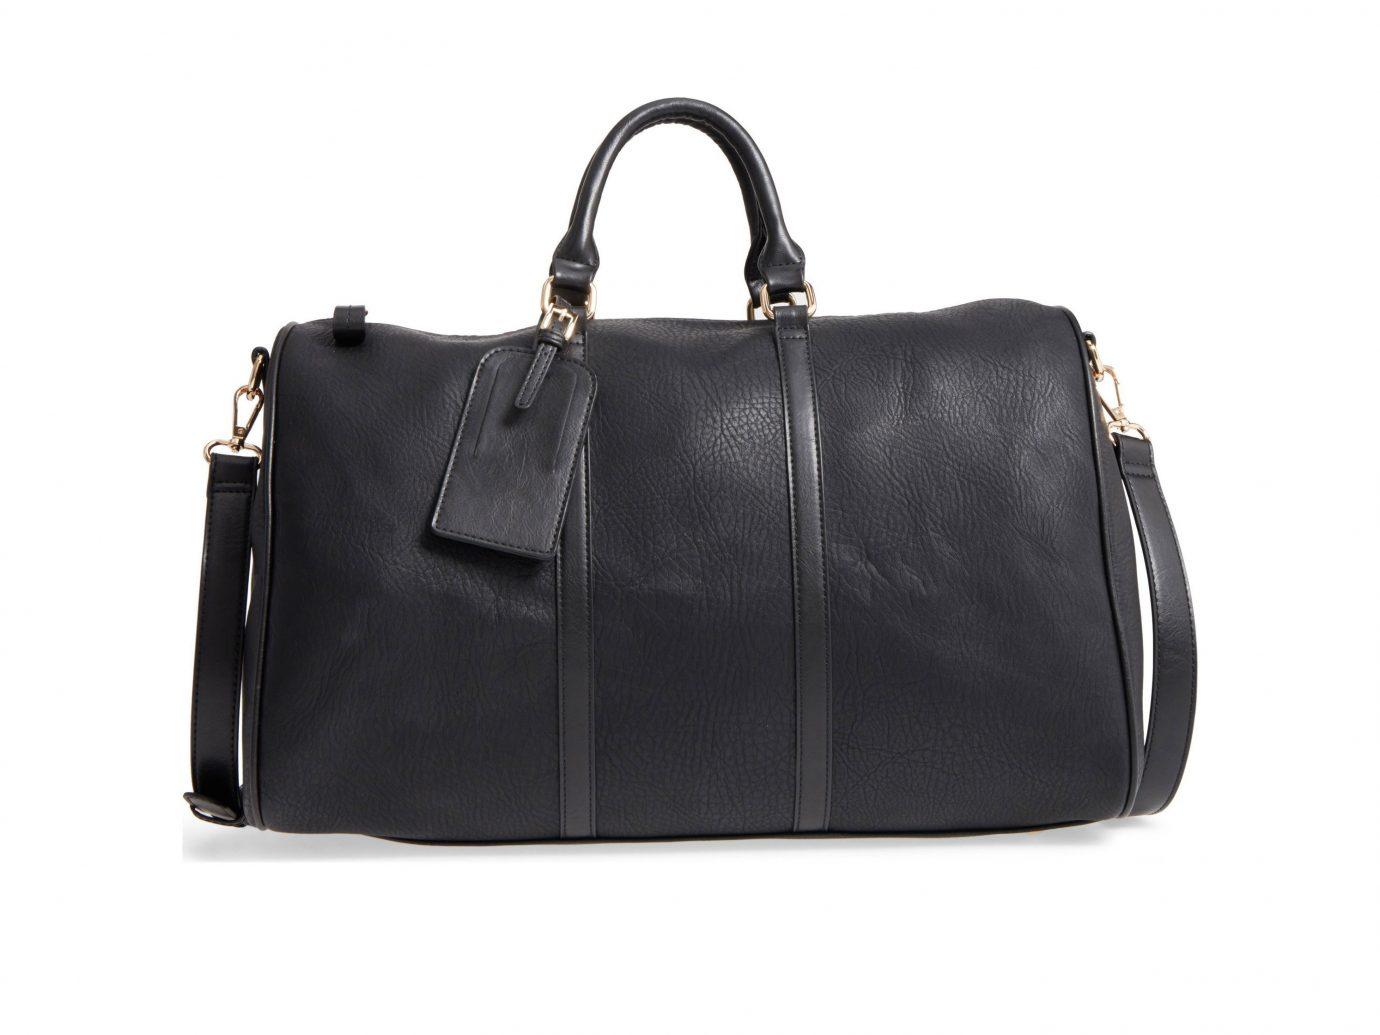 Celebs Style + Design Travel Shop bag handbag black leather fashion accessory shoulder bag product strap hand luggage baggage luggage & bags brand buckle metal animal product